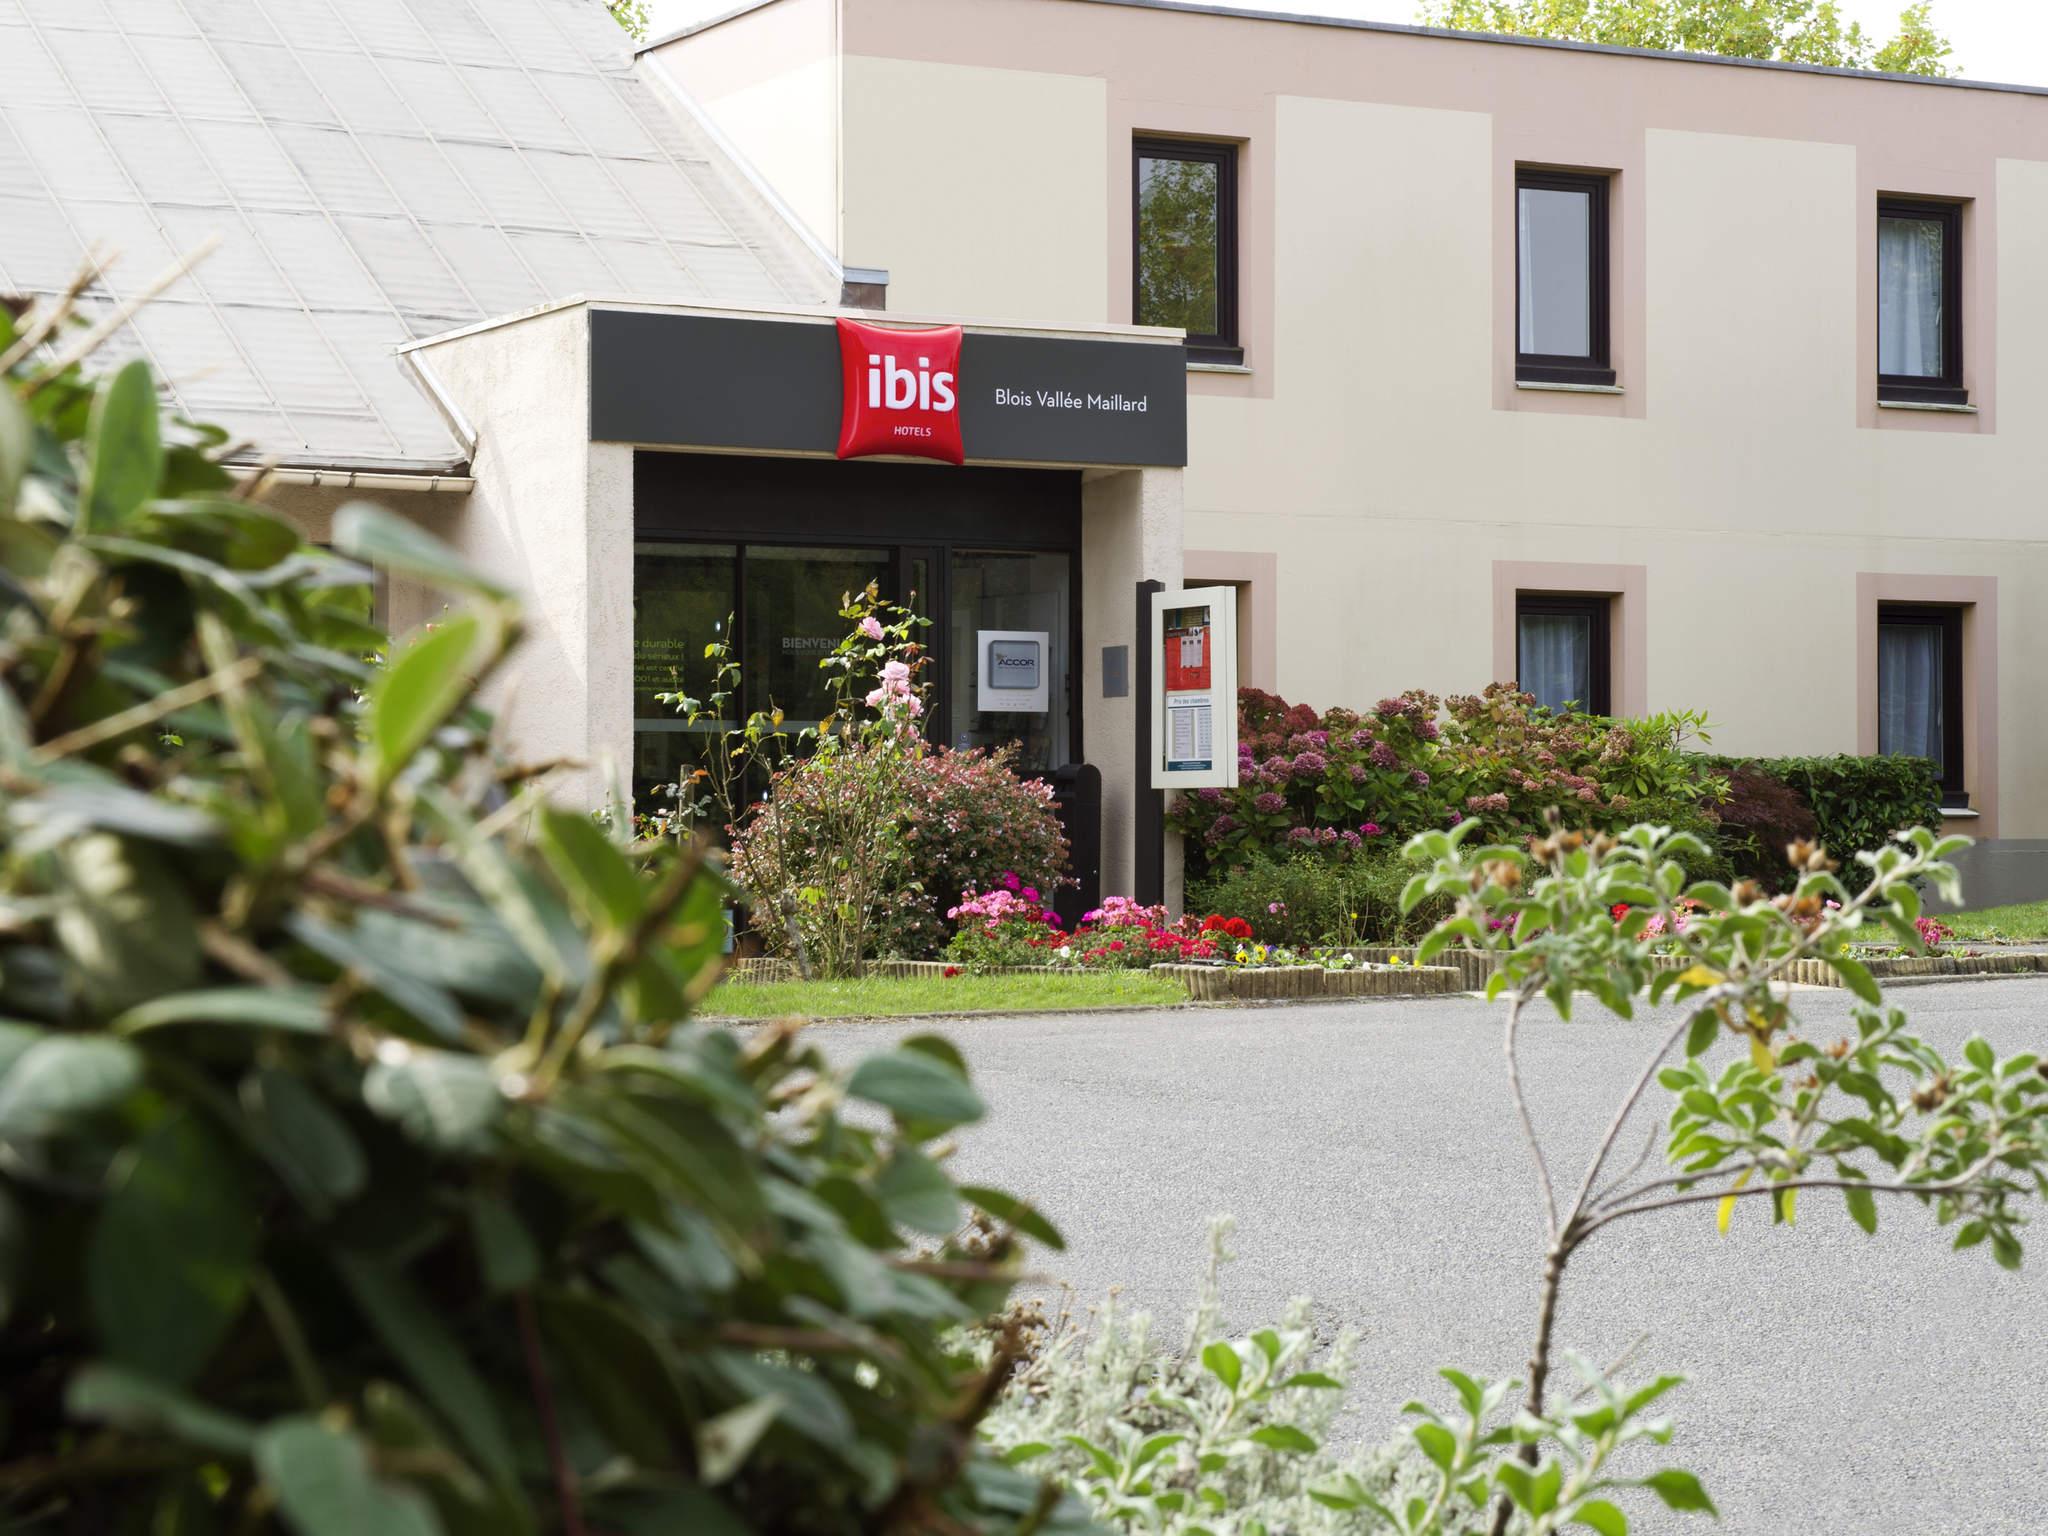 Otel – ibis Blois Vallée Maillard